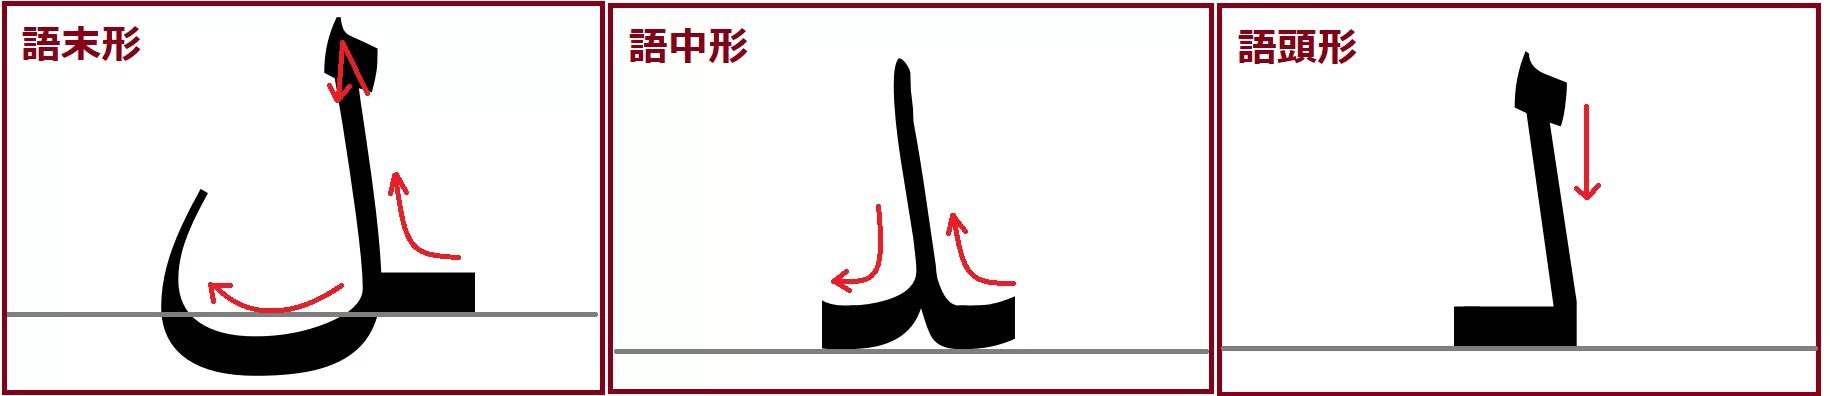 ラーム語頭、語中、語末形